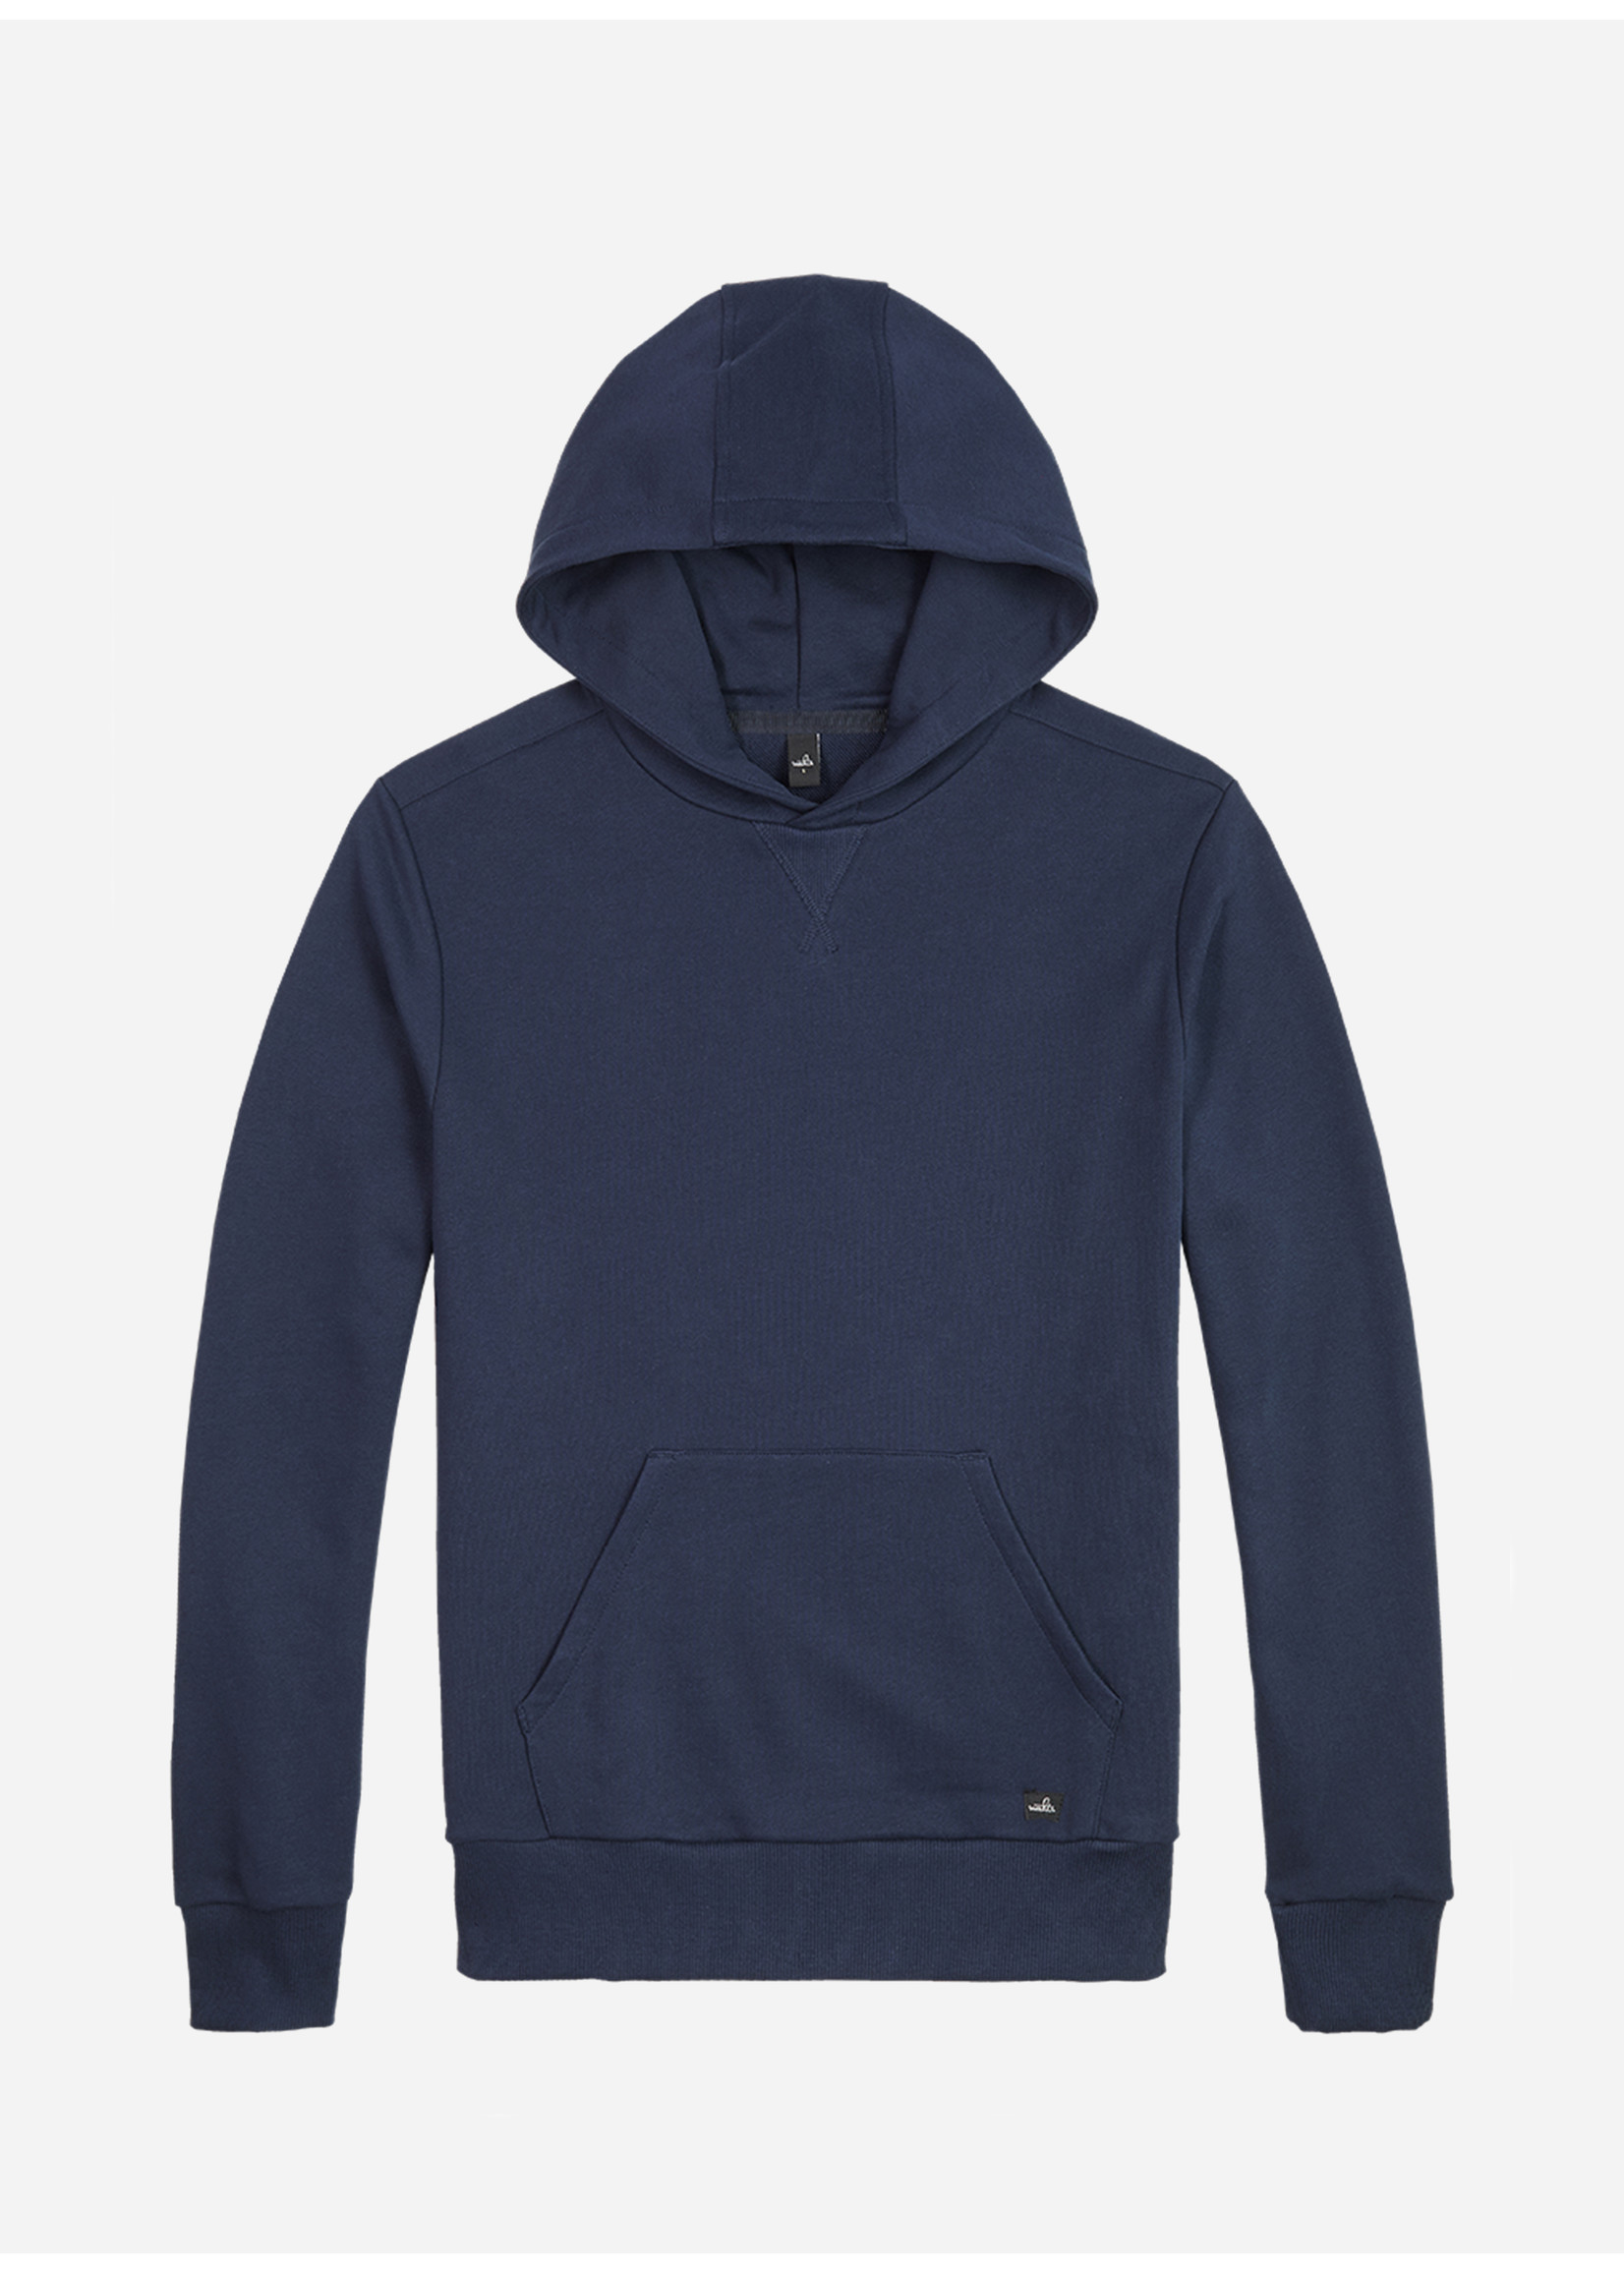 Wahts Vance hooded sweatshirt navy blue